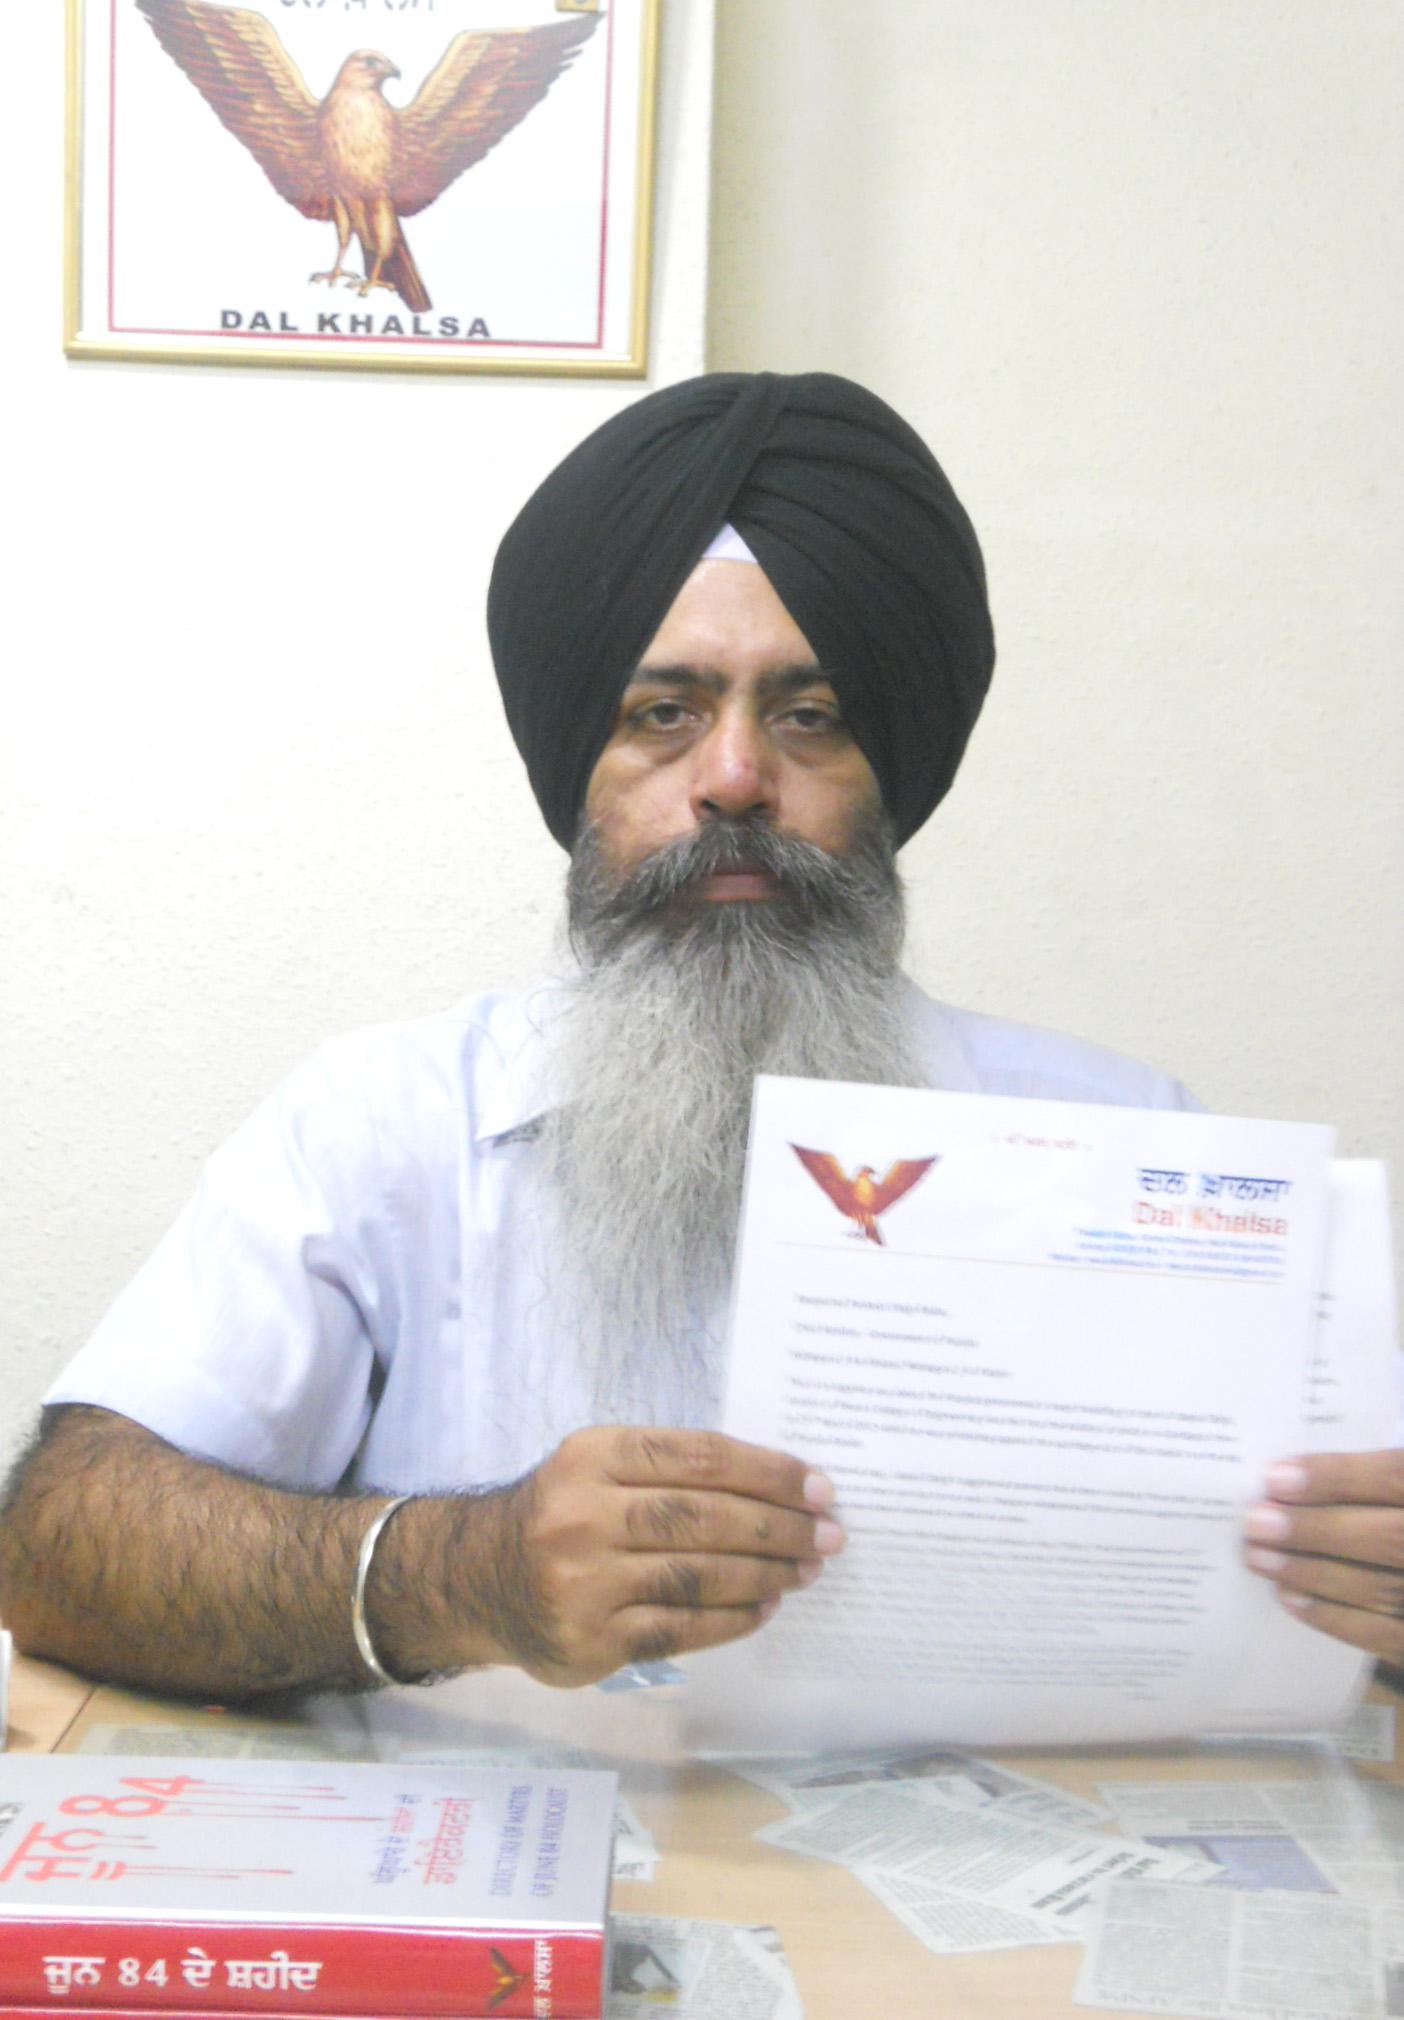 S. Kanwarpal Singh of Dal Khalsa showing letter sent to Punjab CM